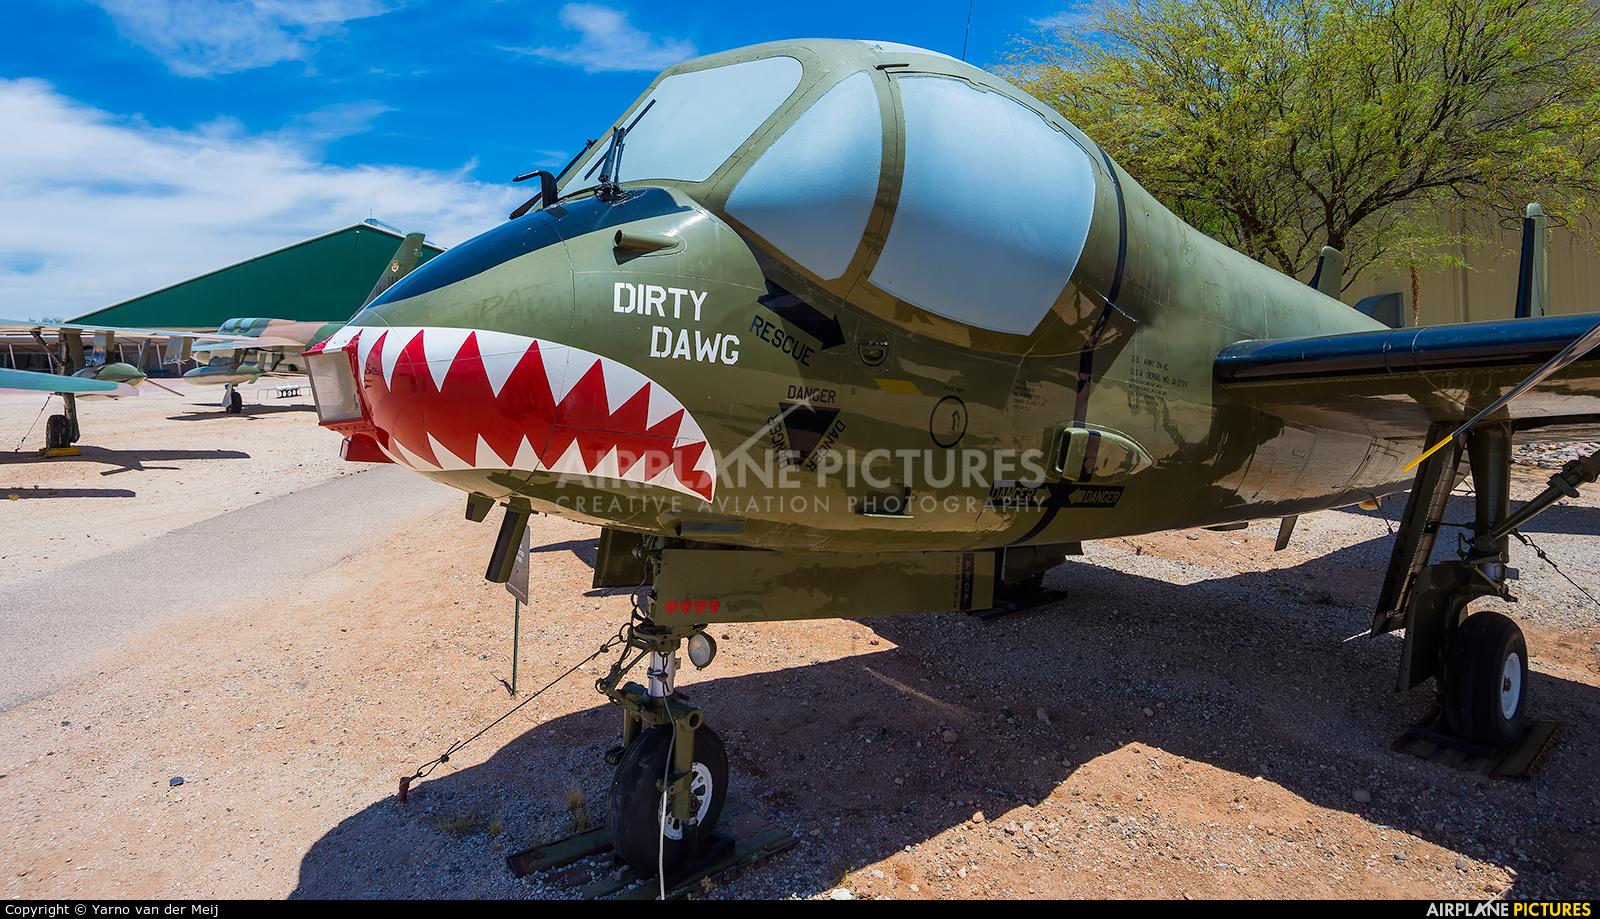 USA - Army 61-2724 aircraft at Tucson - Pima Air & Space Museum